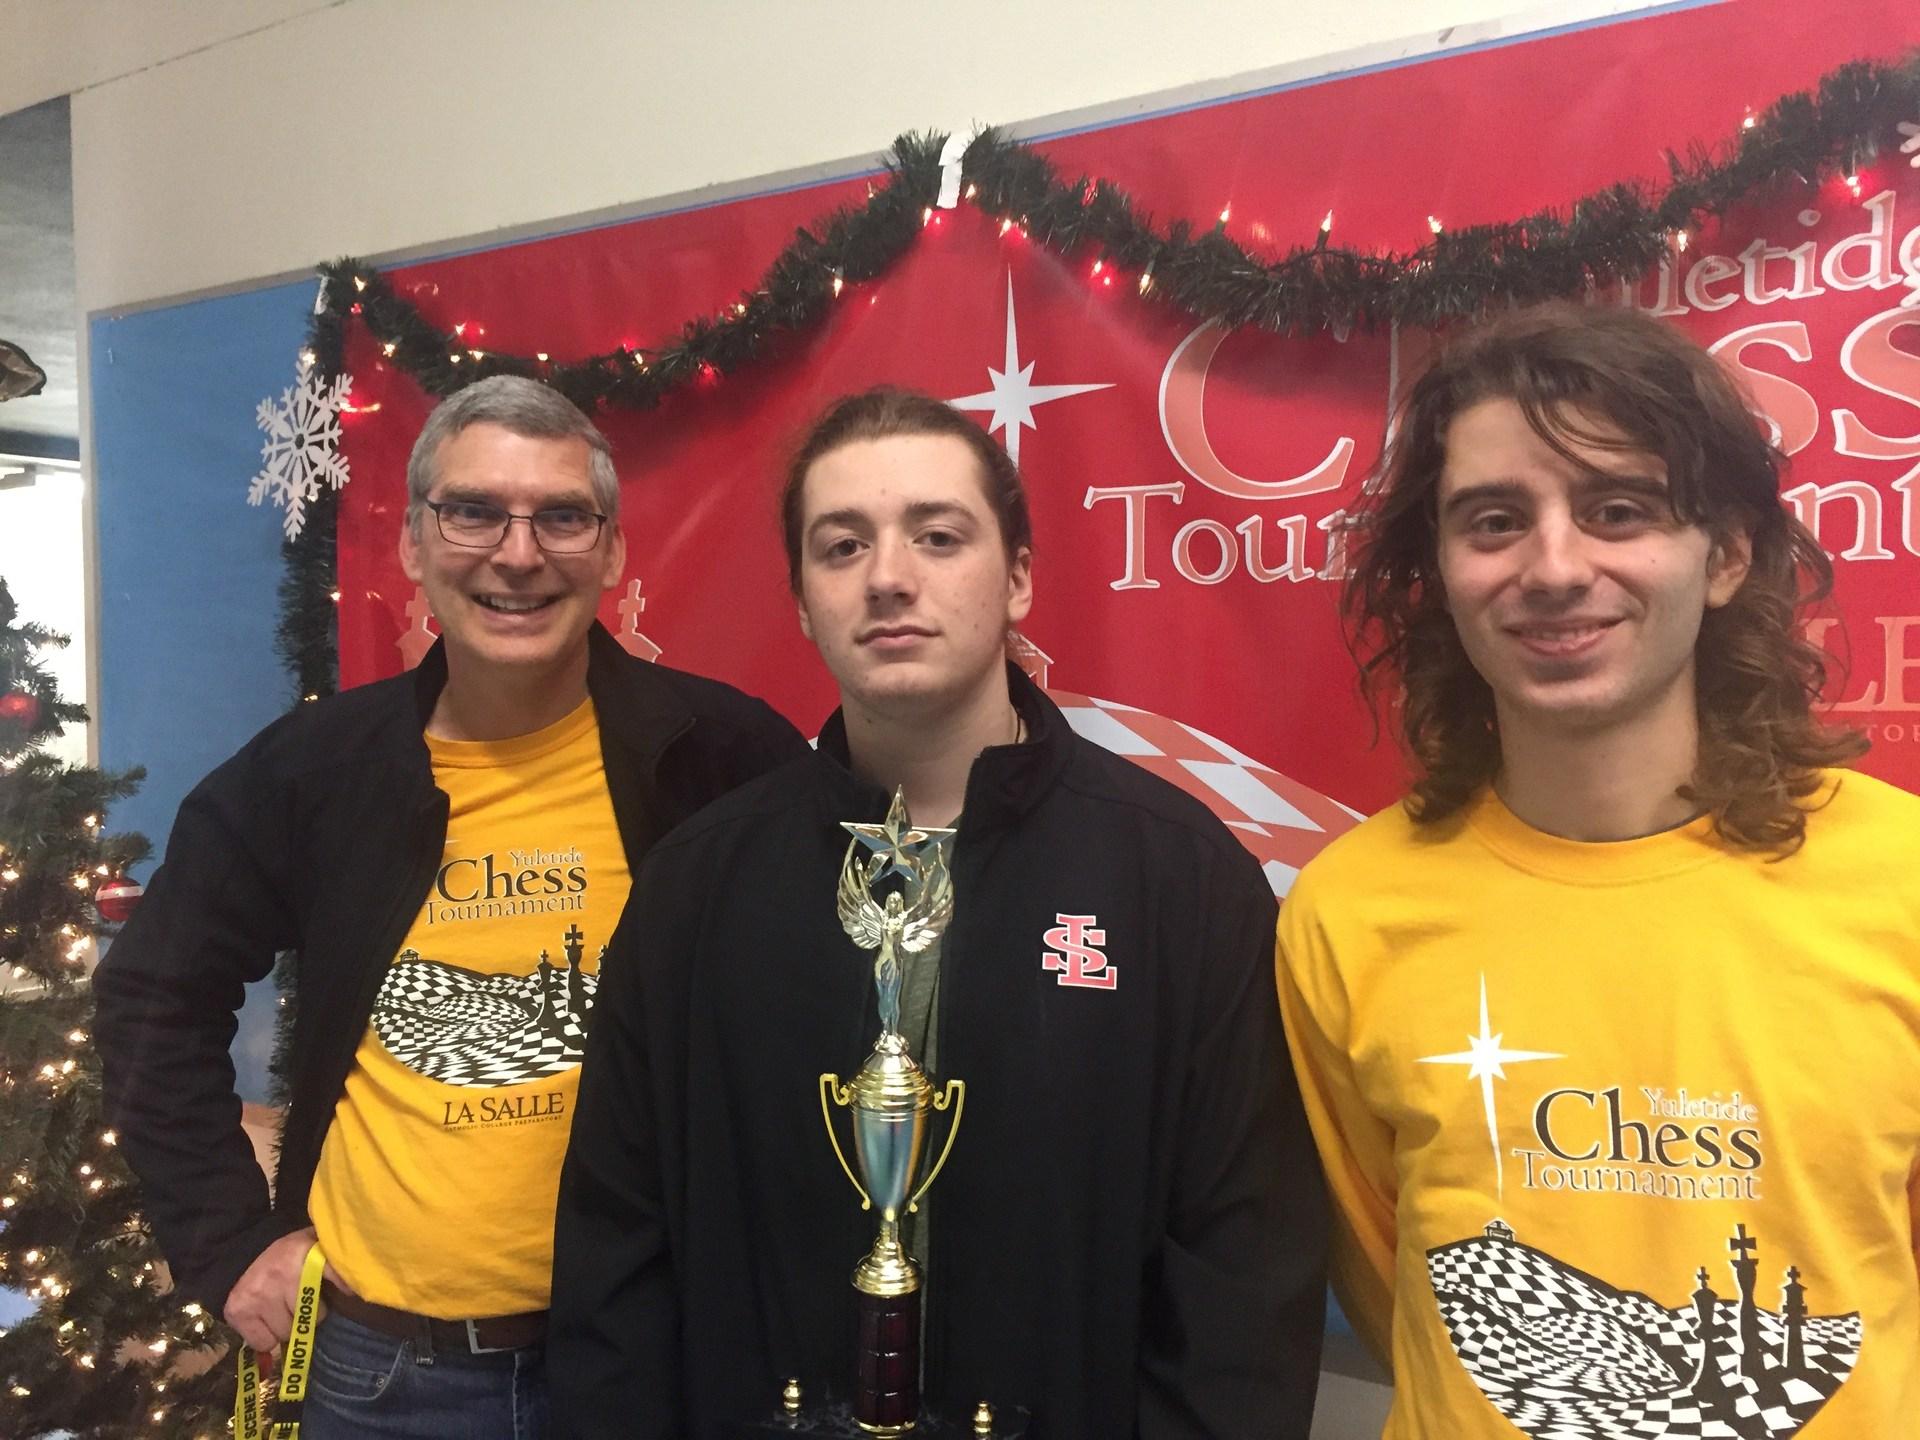 chess tournament trophy winner